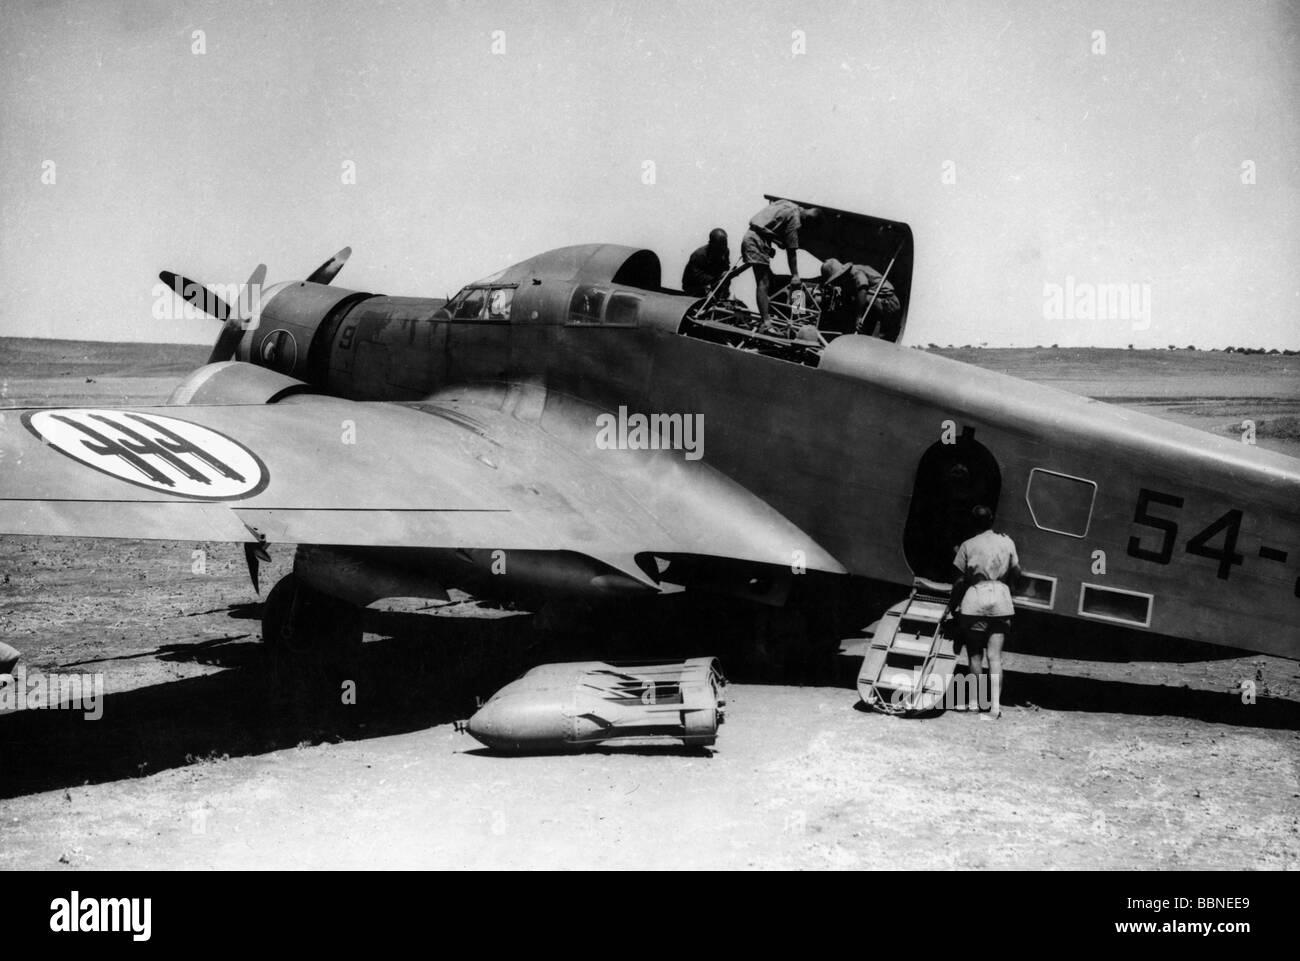 Savoia marchetti sm 79 gobba page 4 - Events Second World War Wwii Aerial Warfare Aircraft Italian Bomber Savoia